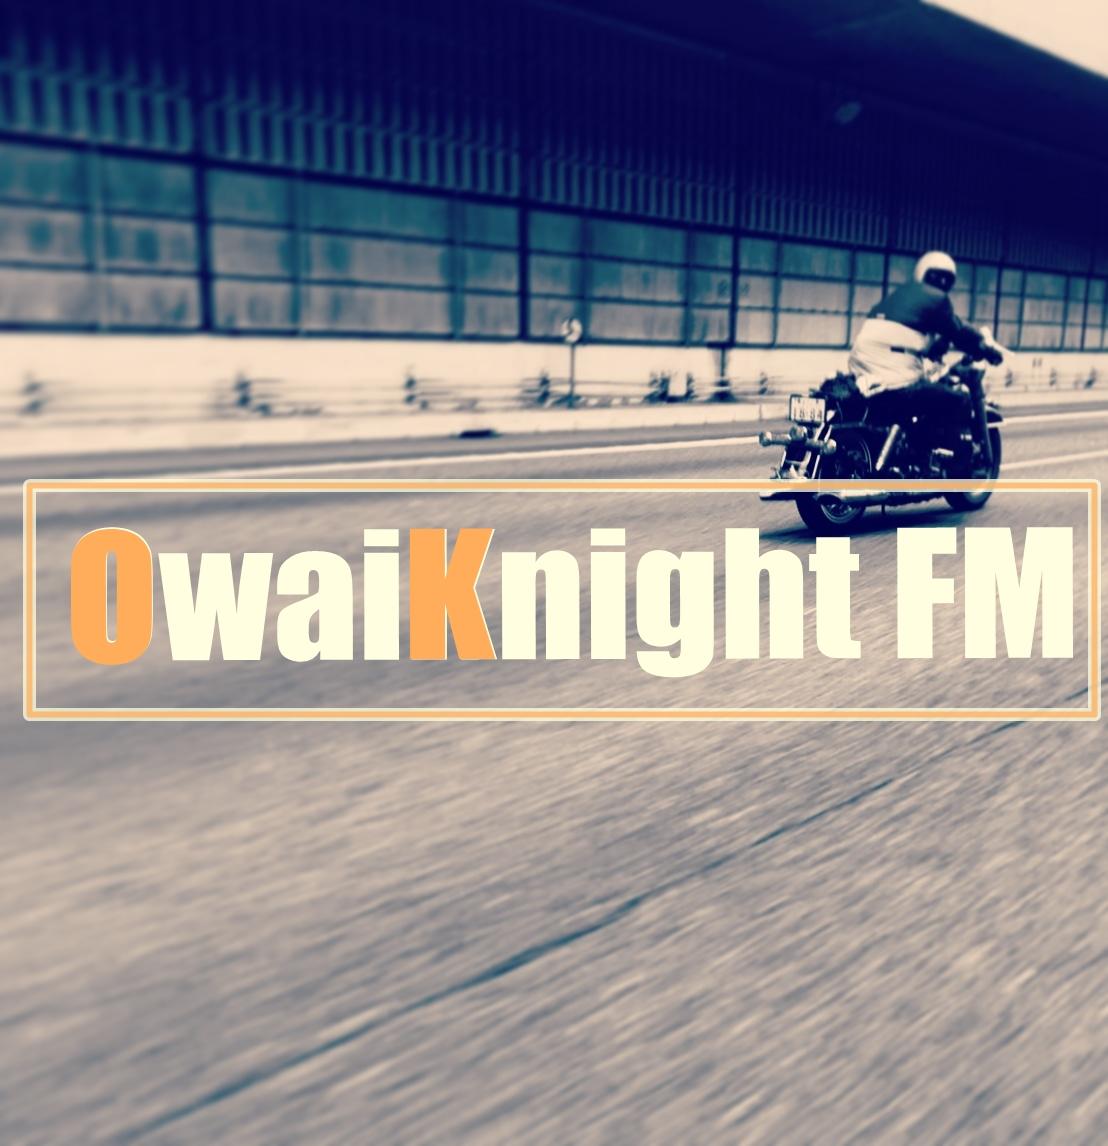 【OwaiKnght FM】#0  はじまりのはじまり